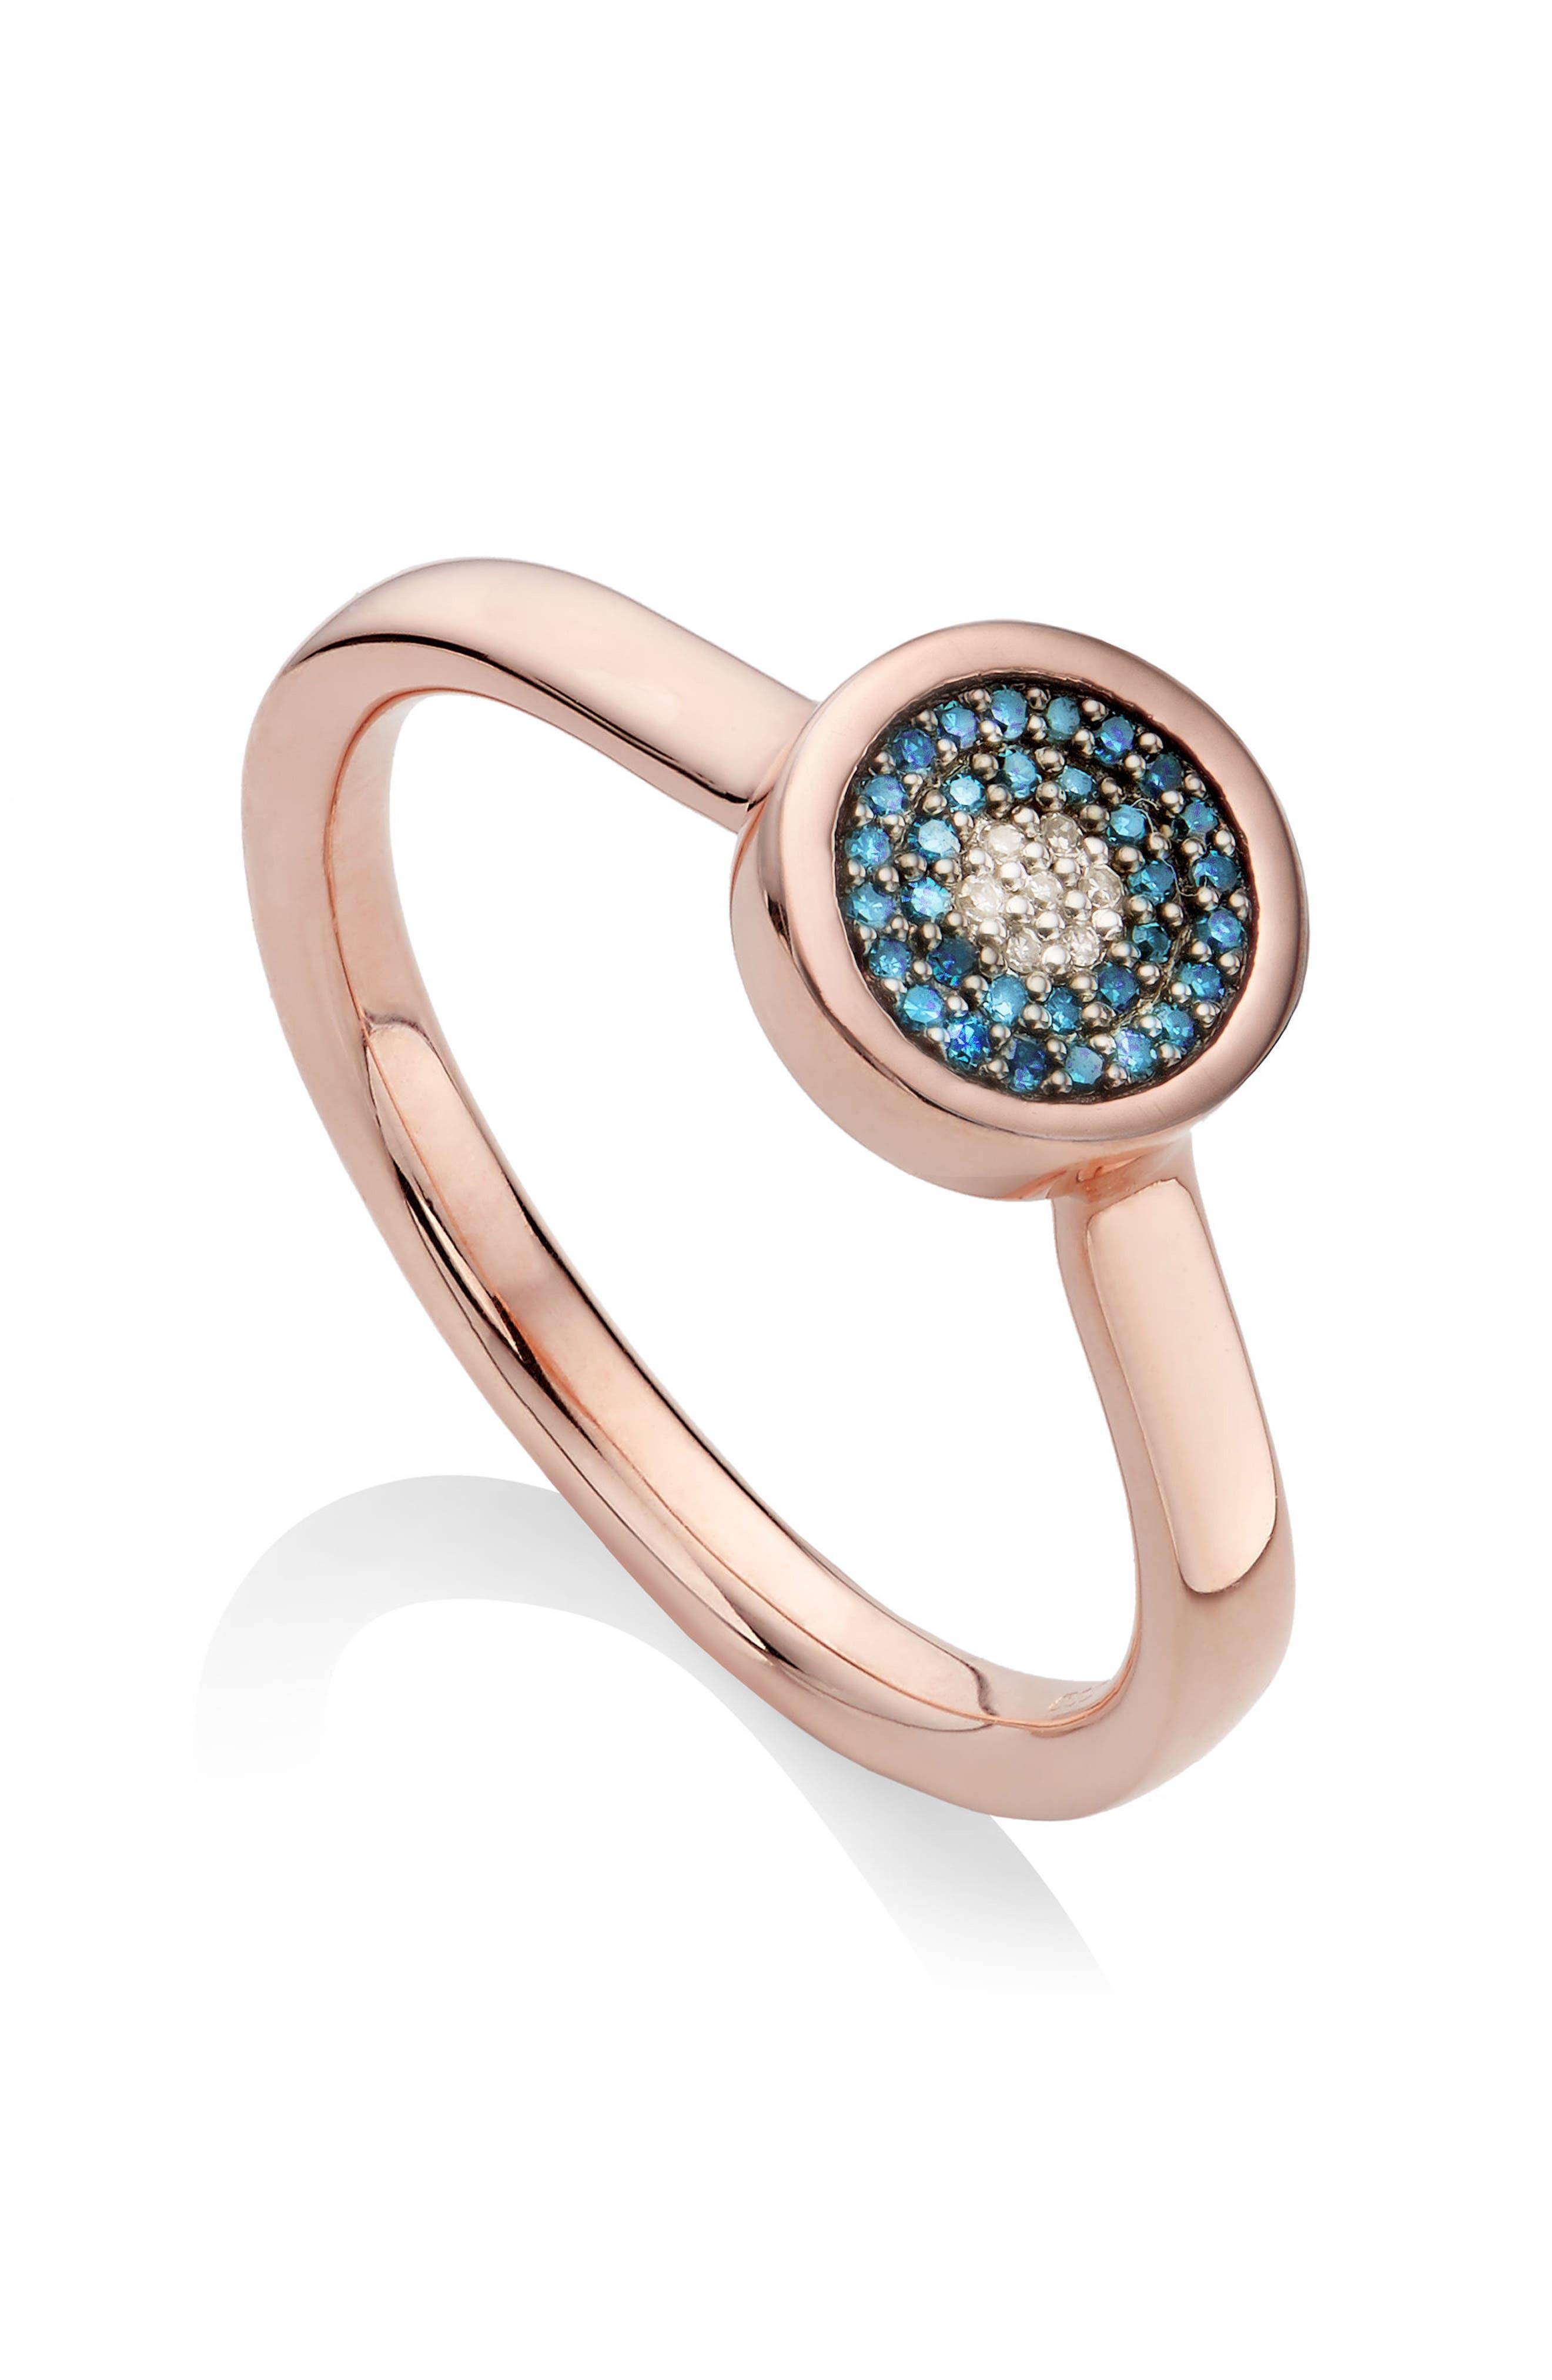 Evil Eye Diamond Ring,                             Alternate thumbnail 3, color,                             ROSE GOLD/ BLUE DIAMOND